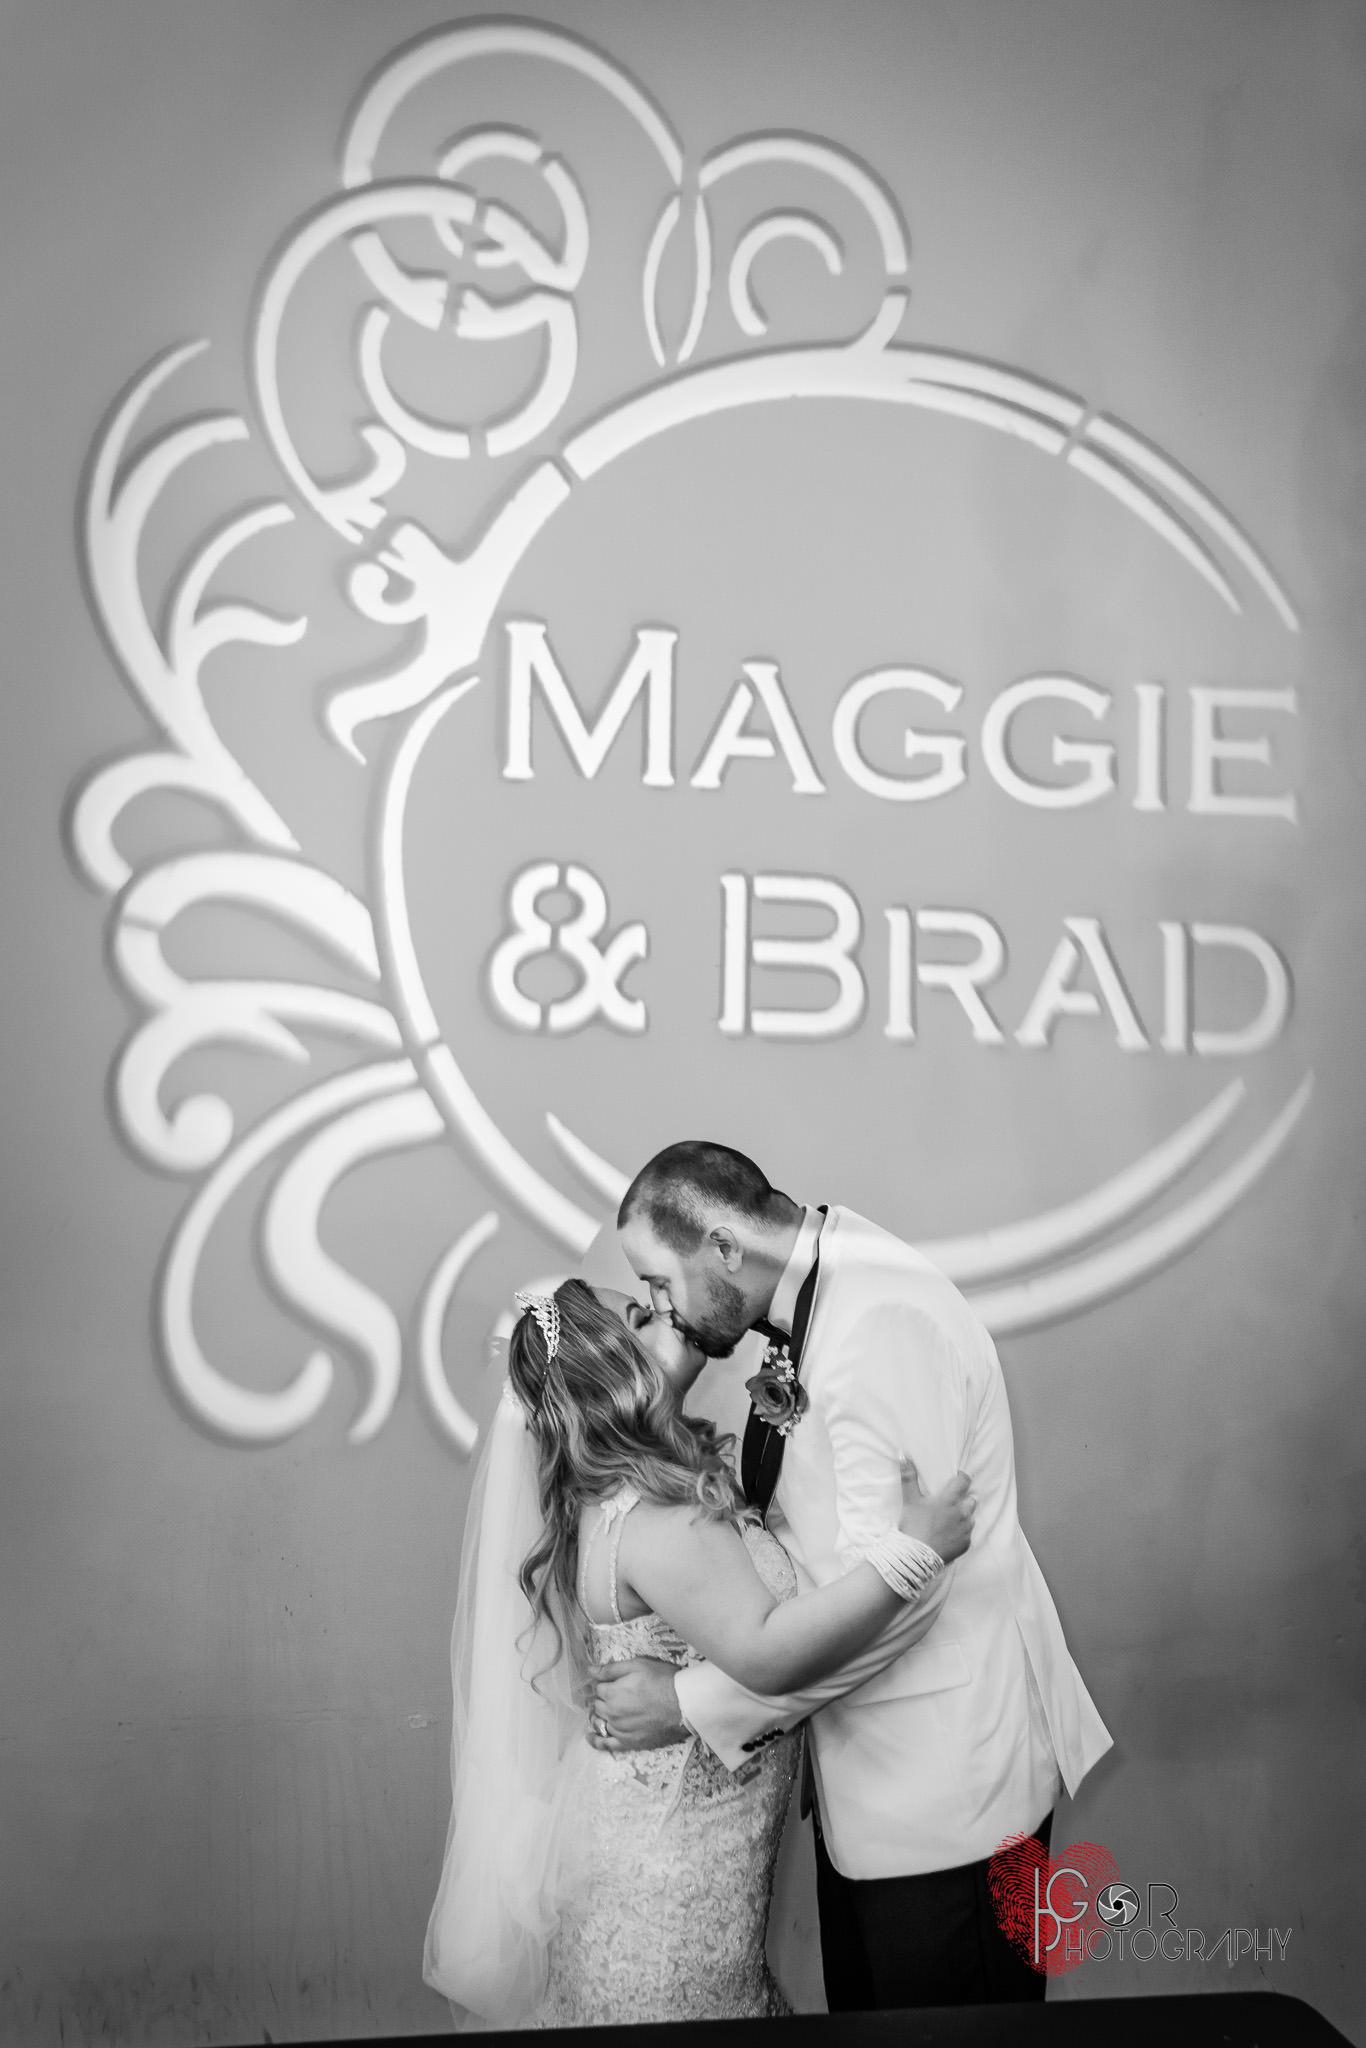 maggie-brad-wedding-top-62.jpg